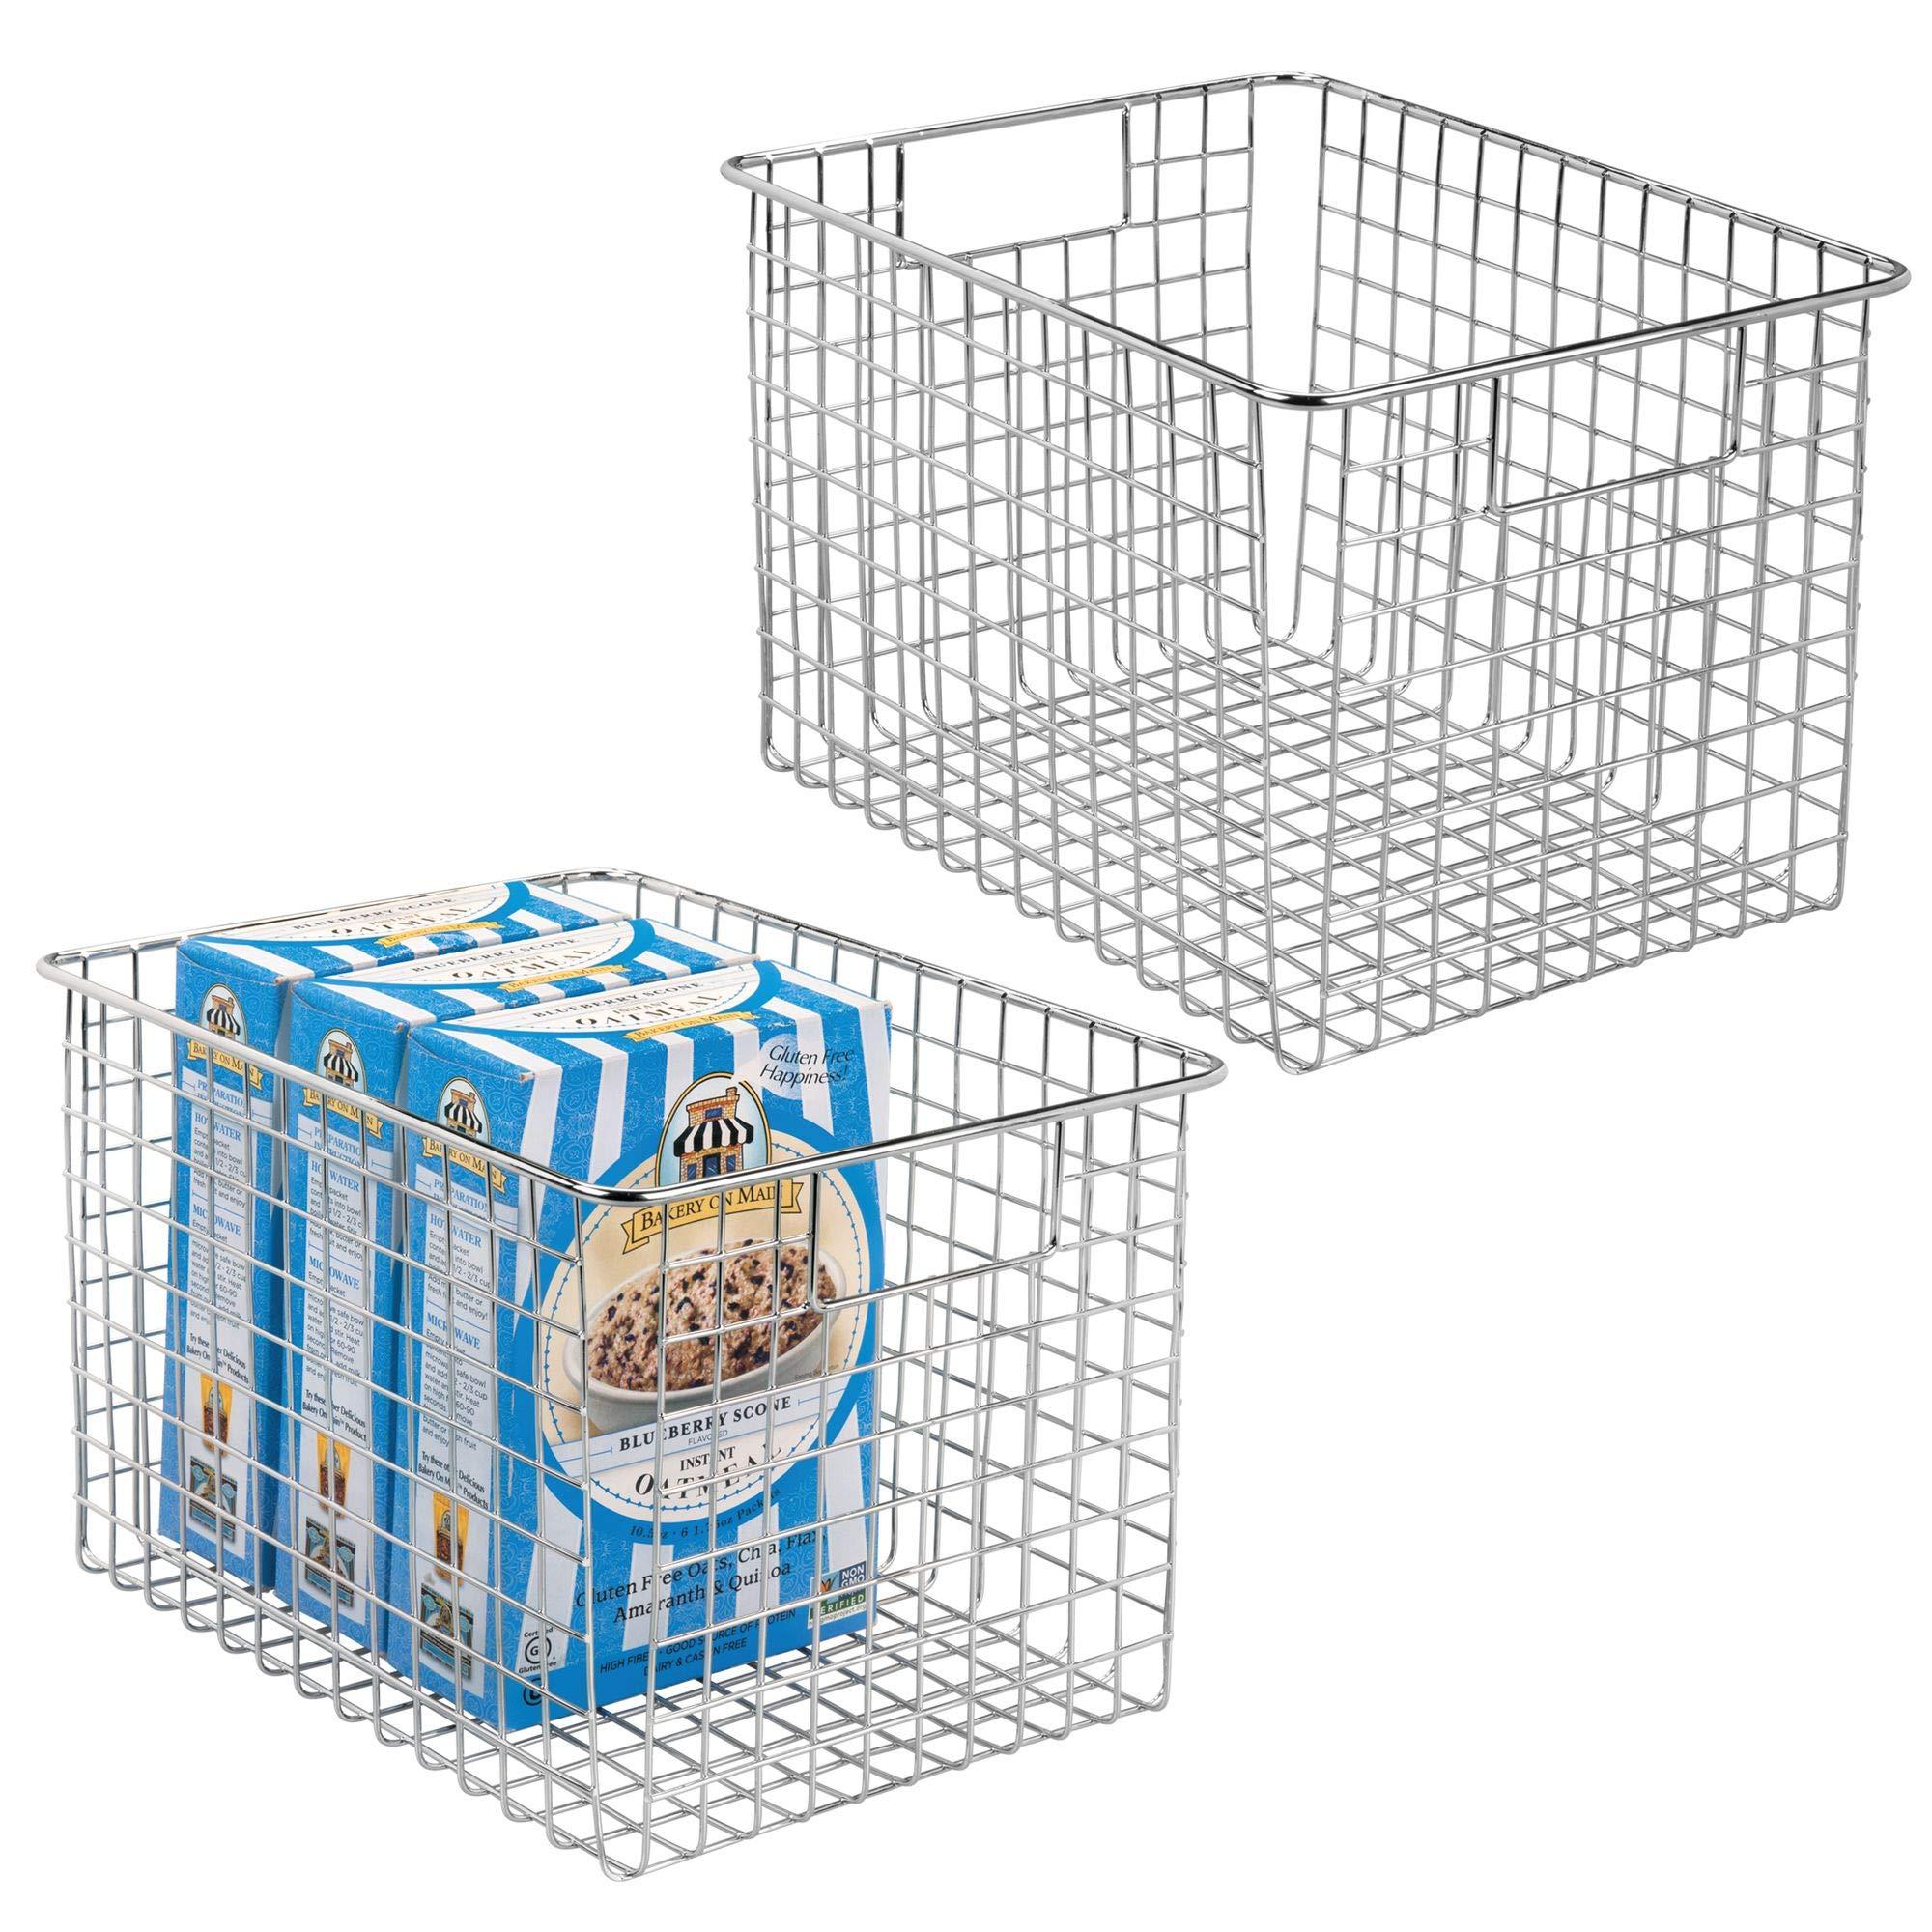 mDesign Kitchen Pantry Freezer Food Storage Organizing Metal Steel Wire Baskets Bins with Handles, 12'' x 9'' x 8'' - Set of 2, Chrome